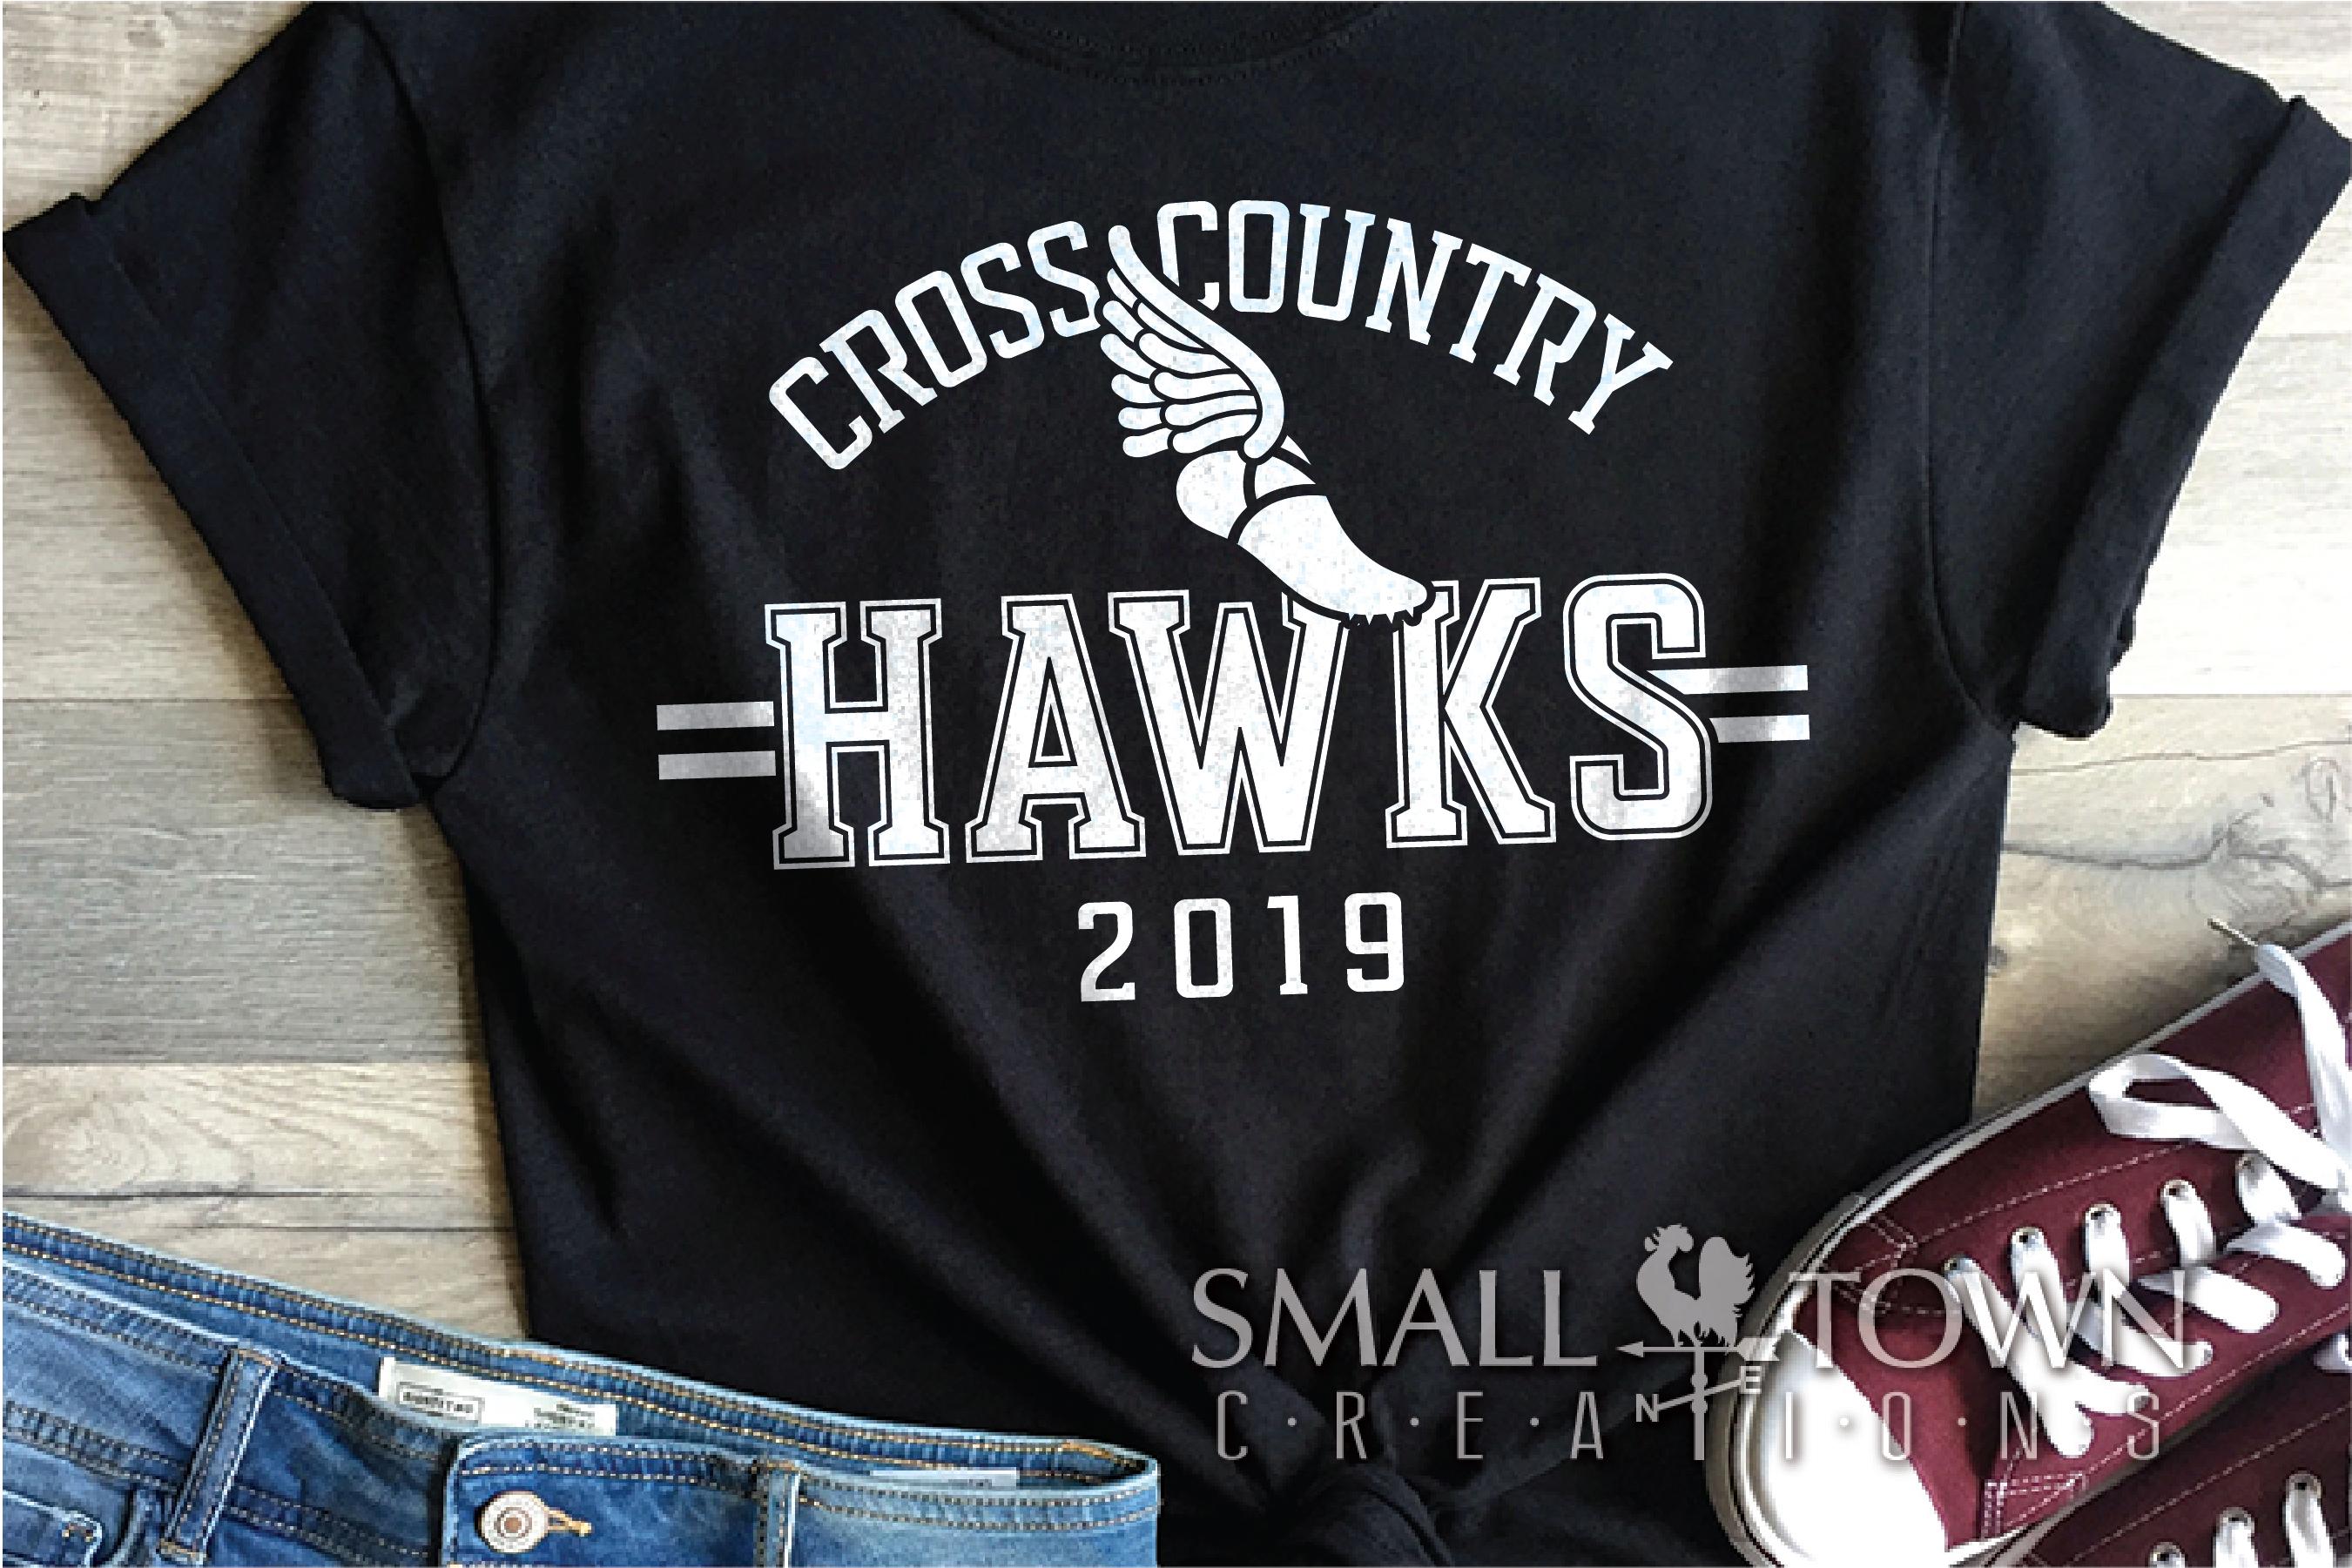 Hawk Cross Country Team, Hawk Mascot, PRINT, CUT & DESIGN example image 1